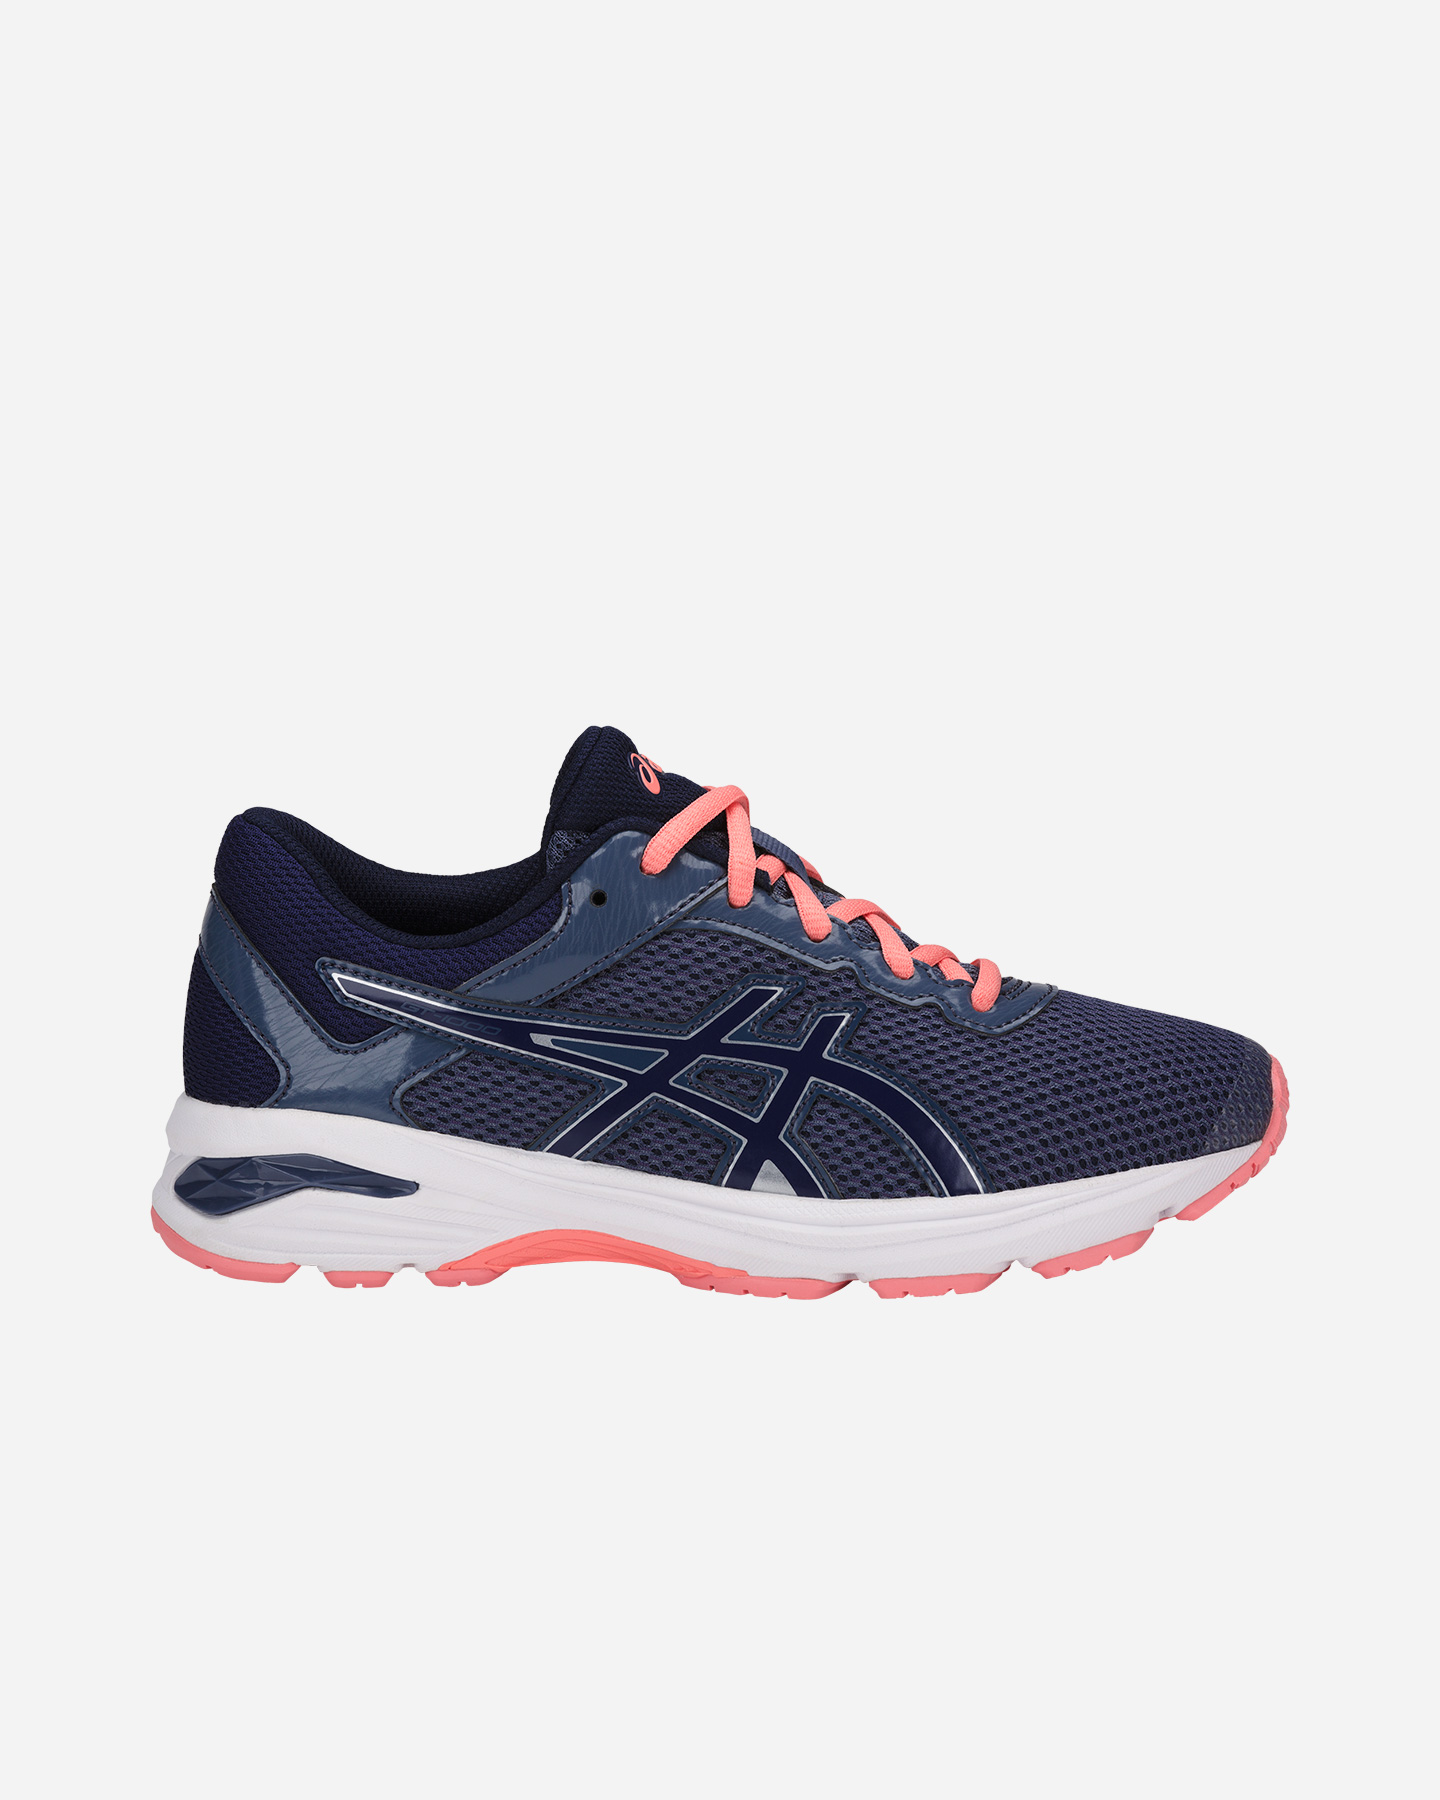 51f065a93 Scarpe Running Asics Gt-1000 6 Gs Jr C740N-5649 | Cisalfa Sport